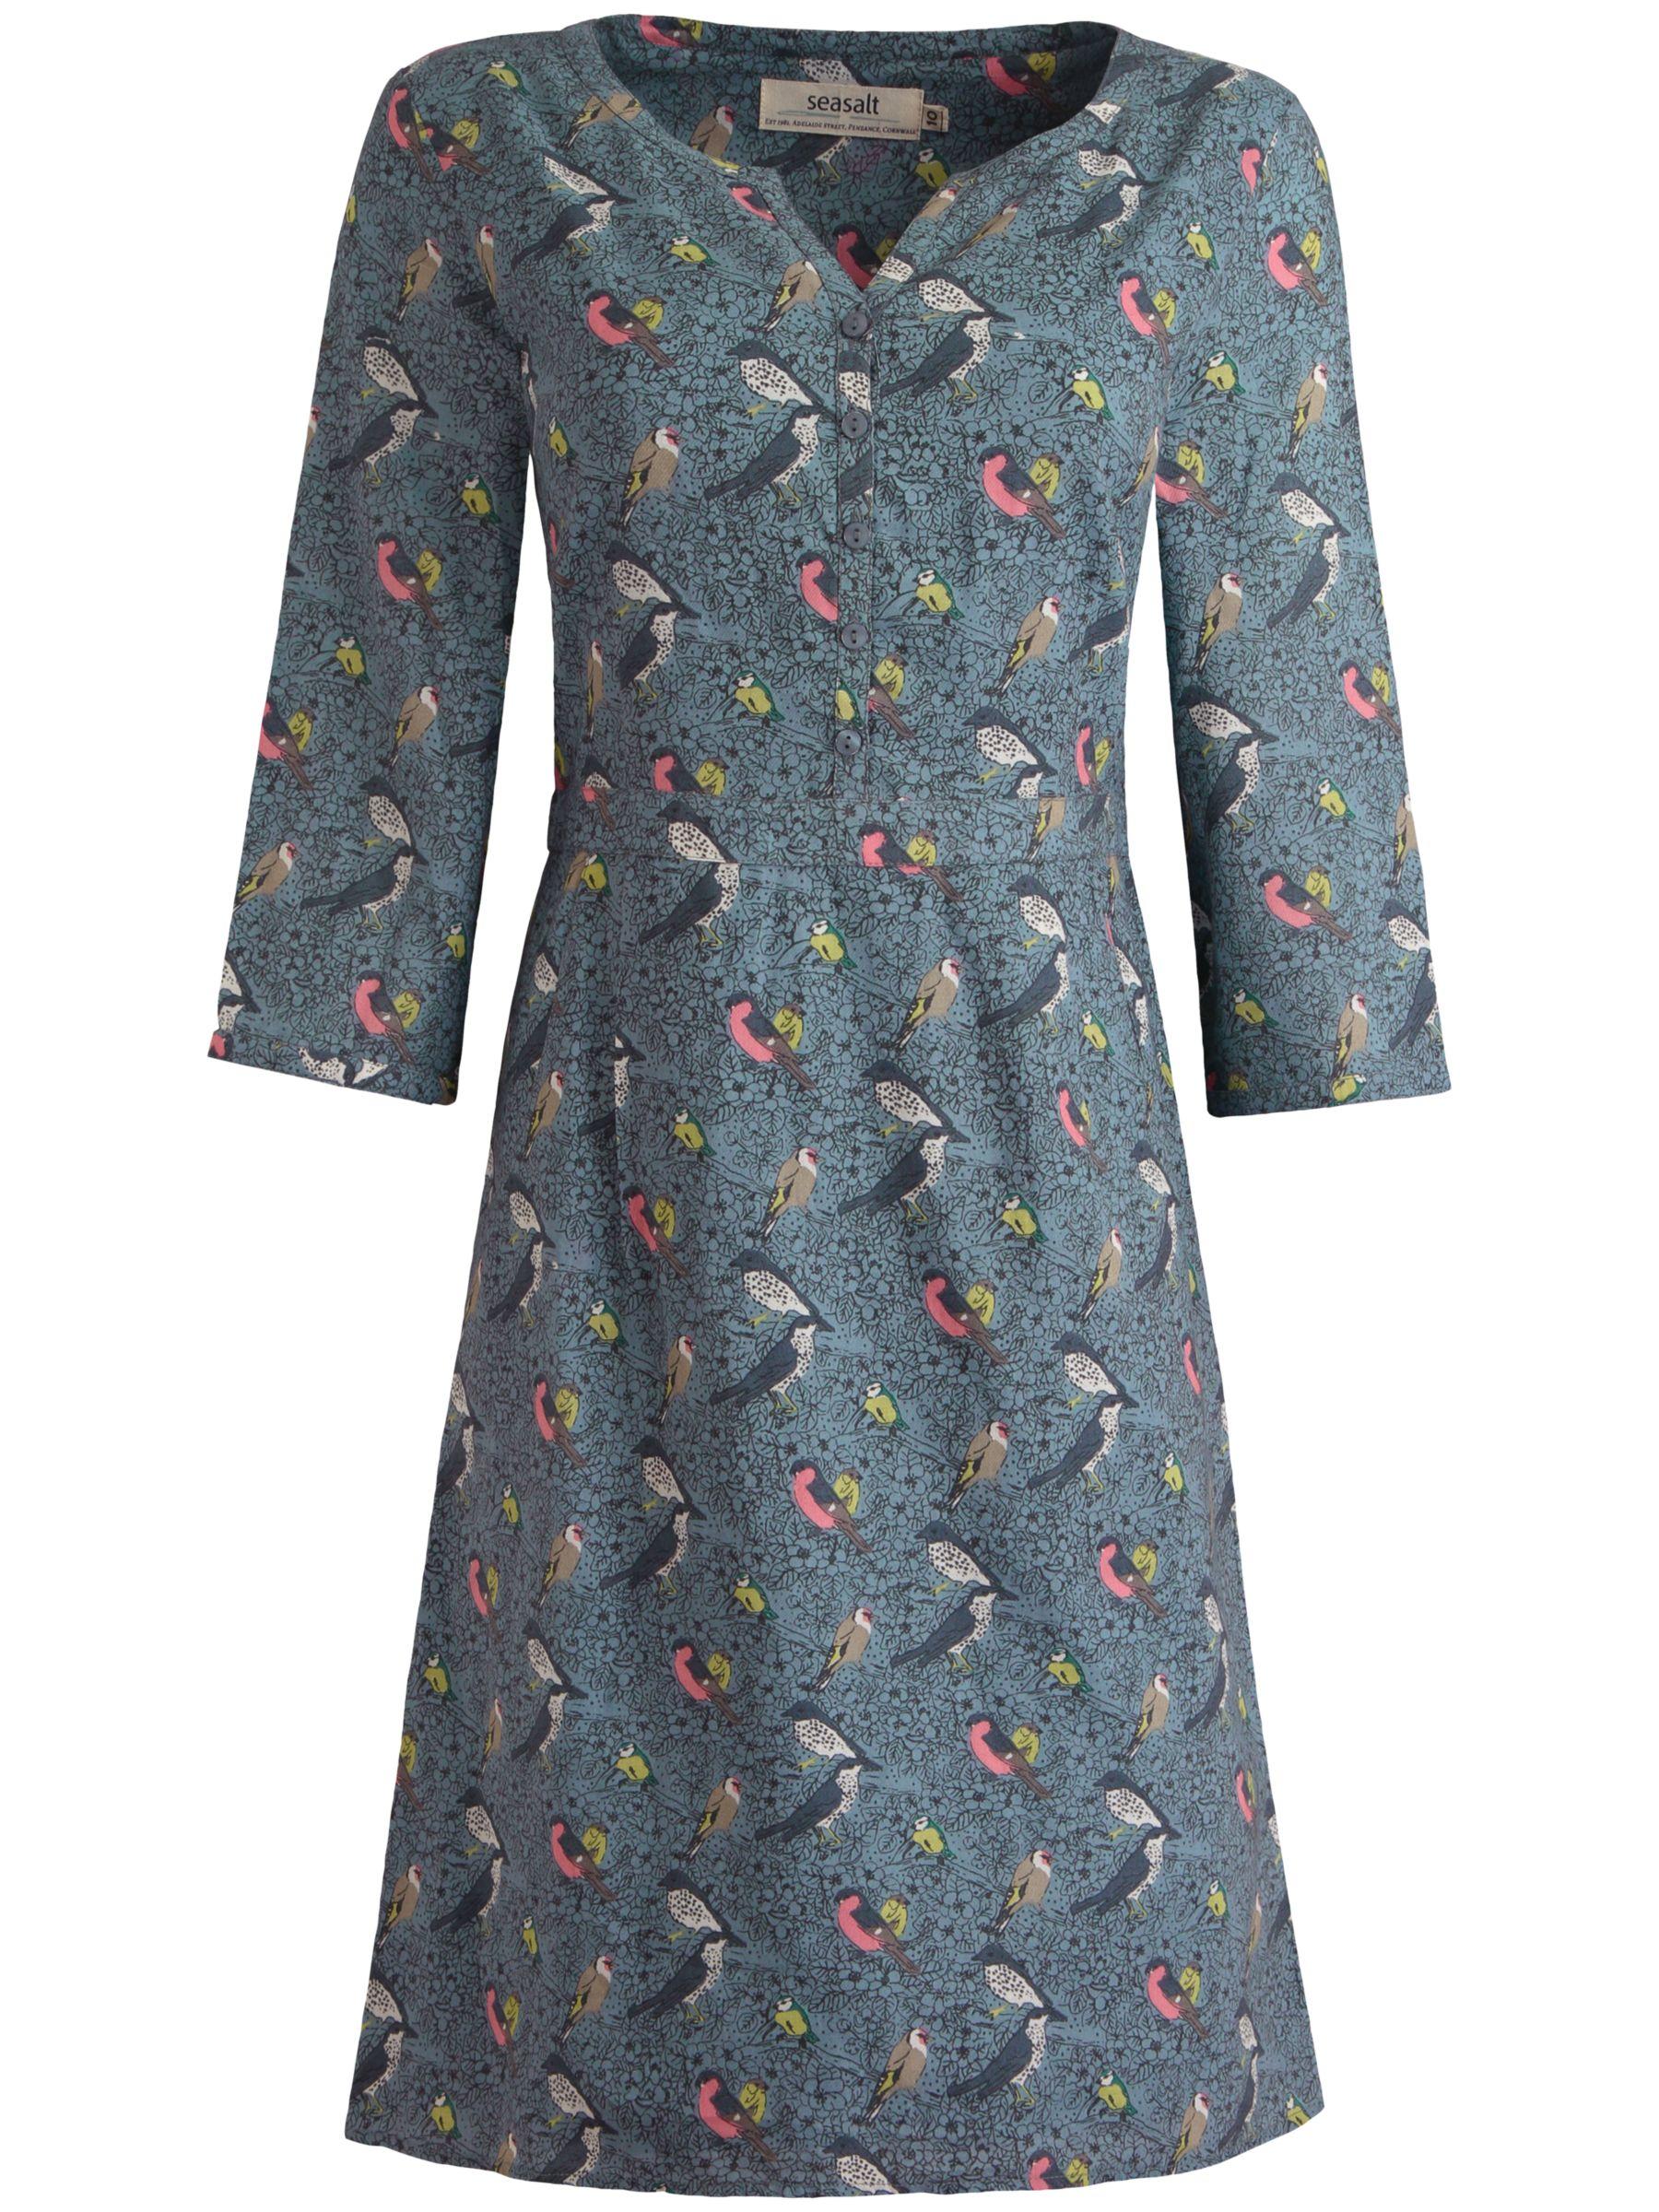 seasalt bunting dress cornish birds pumice, seasalt, bunting, dress, cornish, birds, pumice, 12|10|14|16|8, women, womens dresses, 1783151